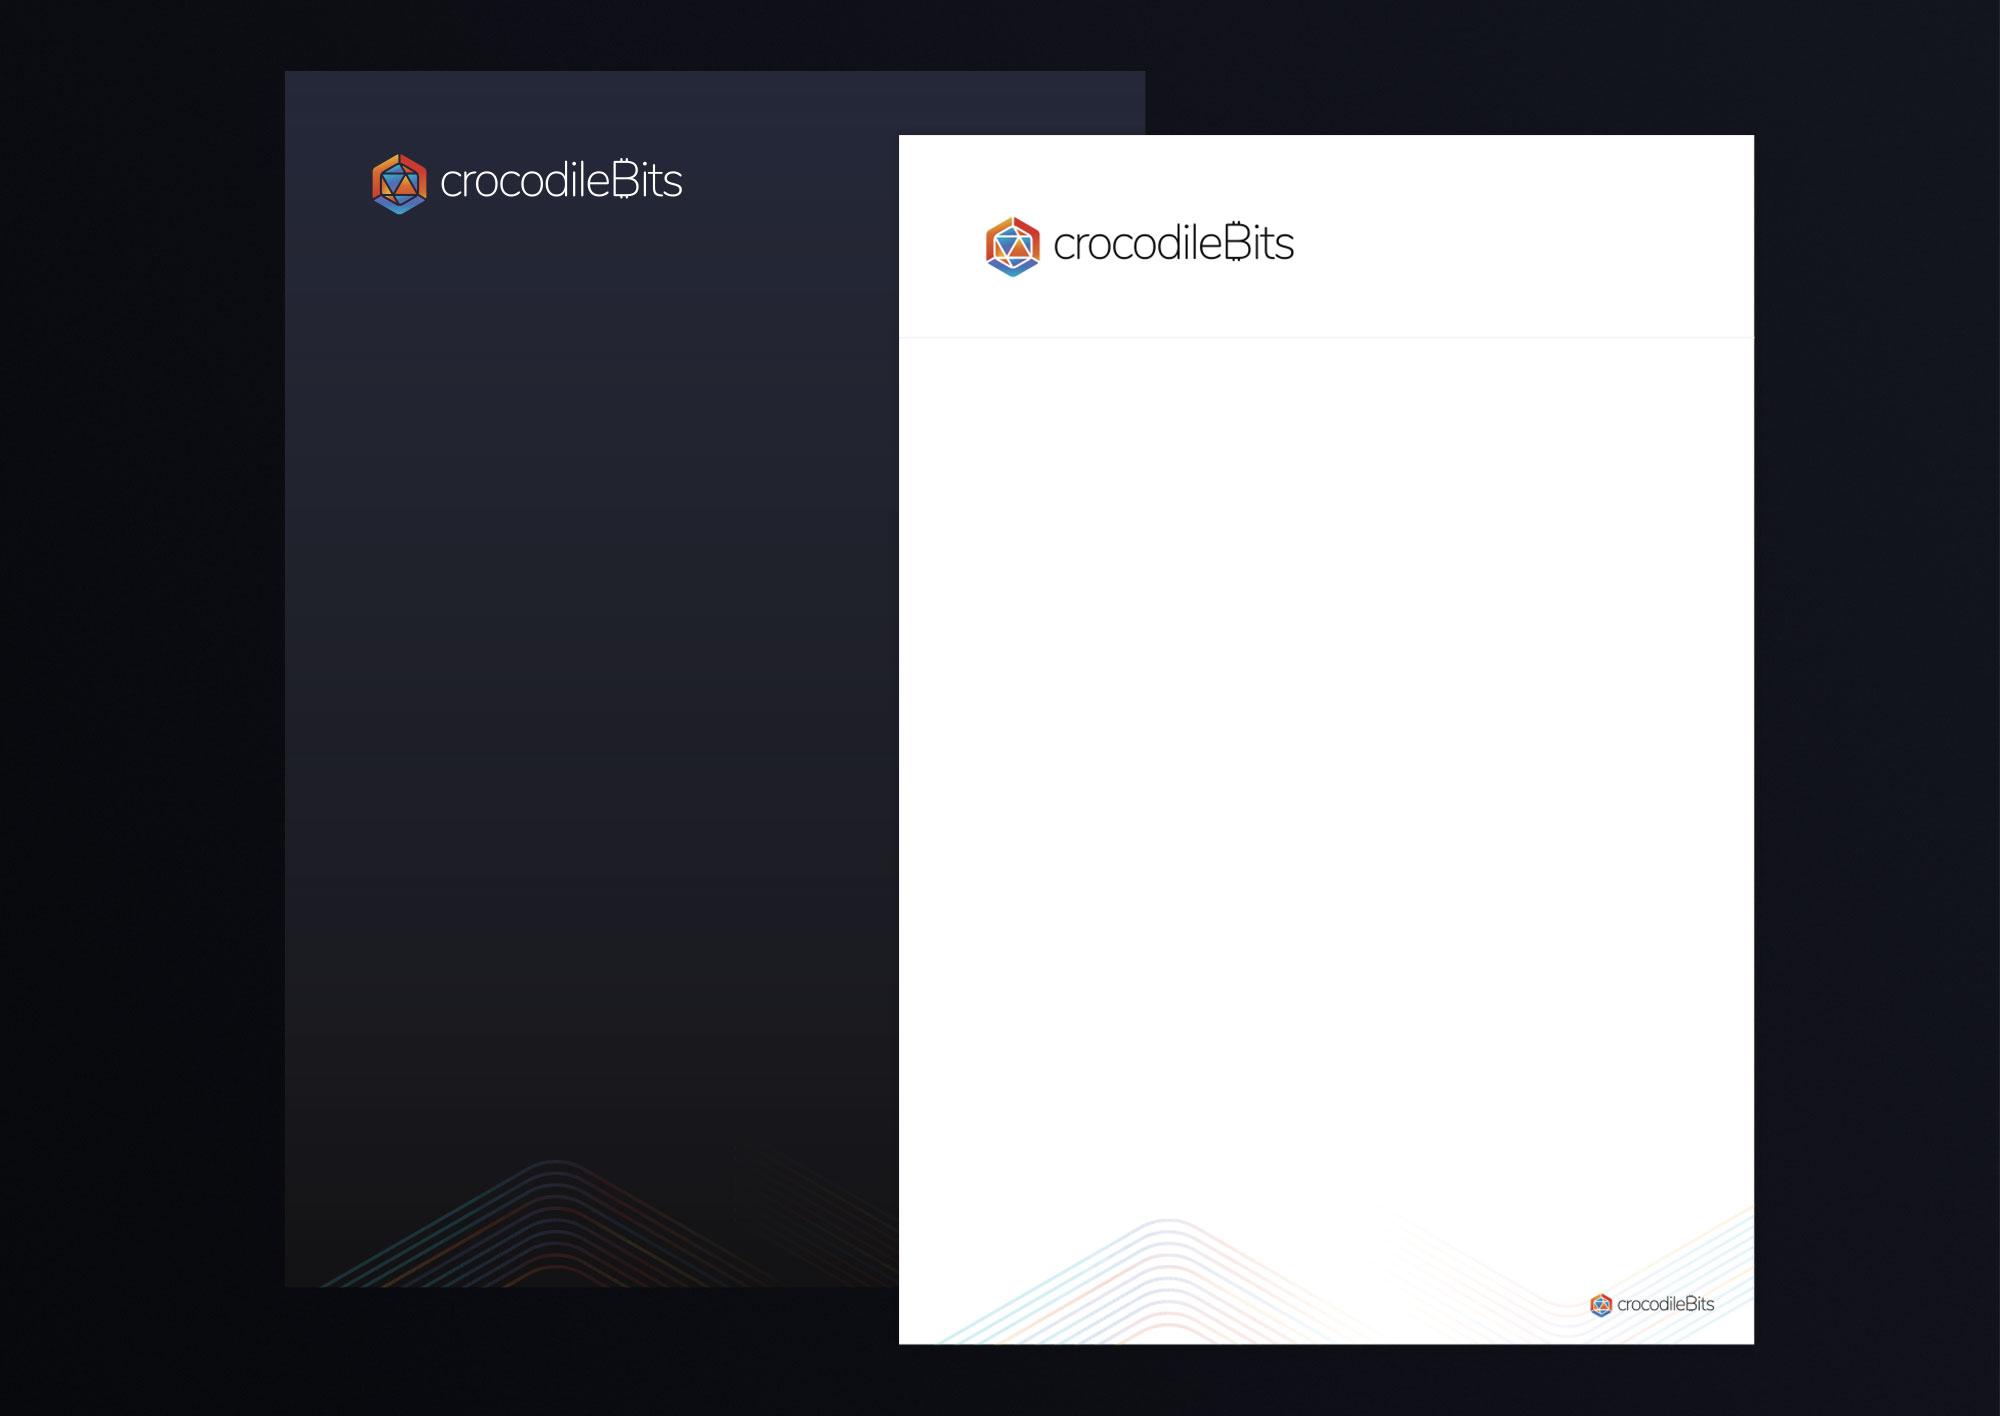 Branding stationary crypto currency יצירת מותג מטבע קריפטוגרפי ניירת CrocodileBits